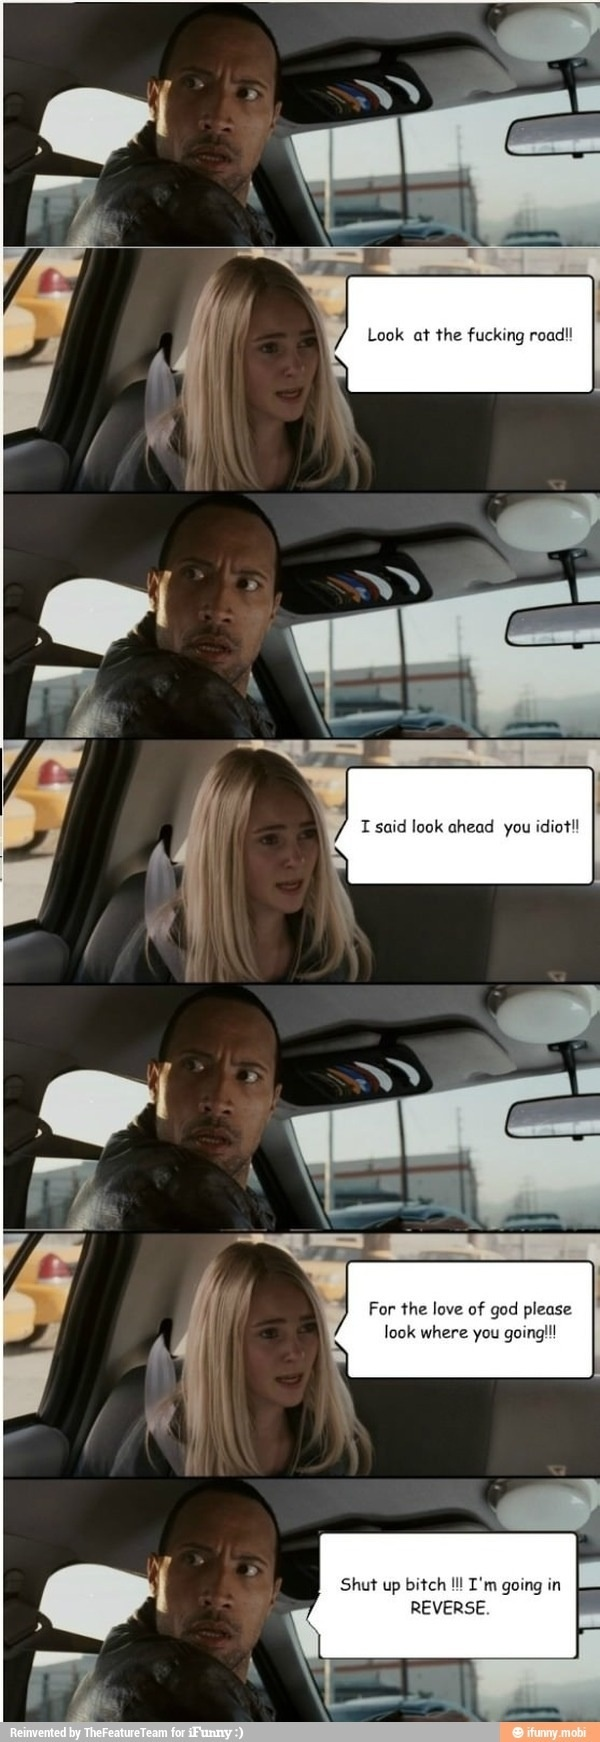 #lol #funny Dwayne Johnson